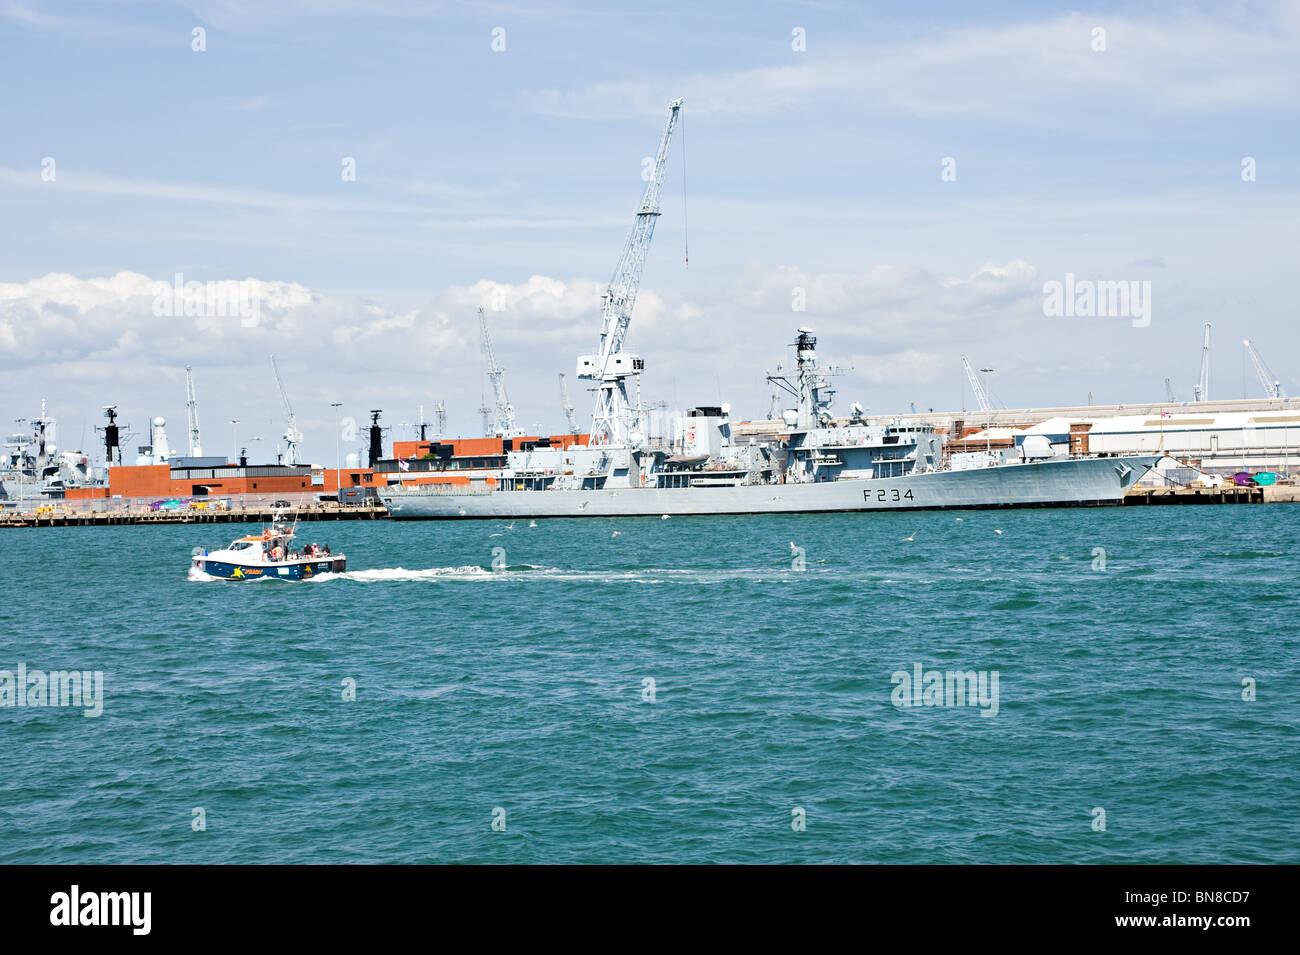 British Royal Navy Type 23 Duke Class Frigate HMS Iron Duke F234 Docked at Portsmouth Naval Dockyard England United - Stock Image